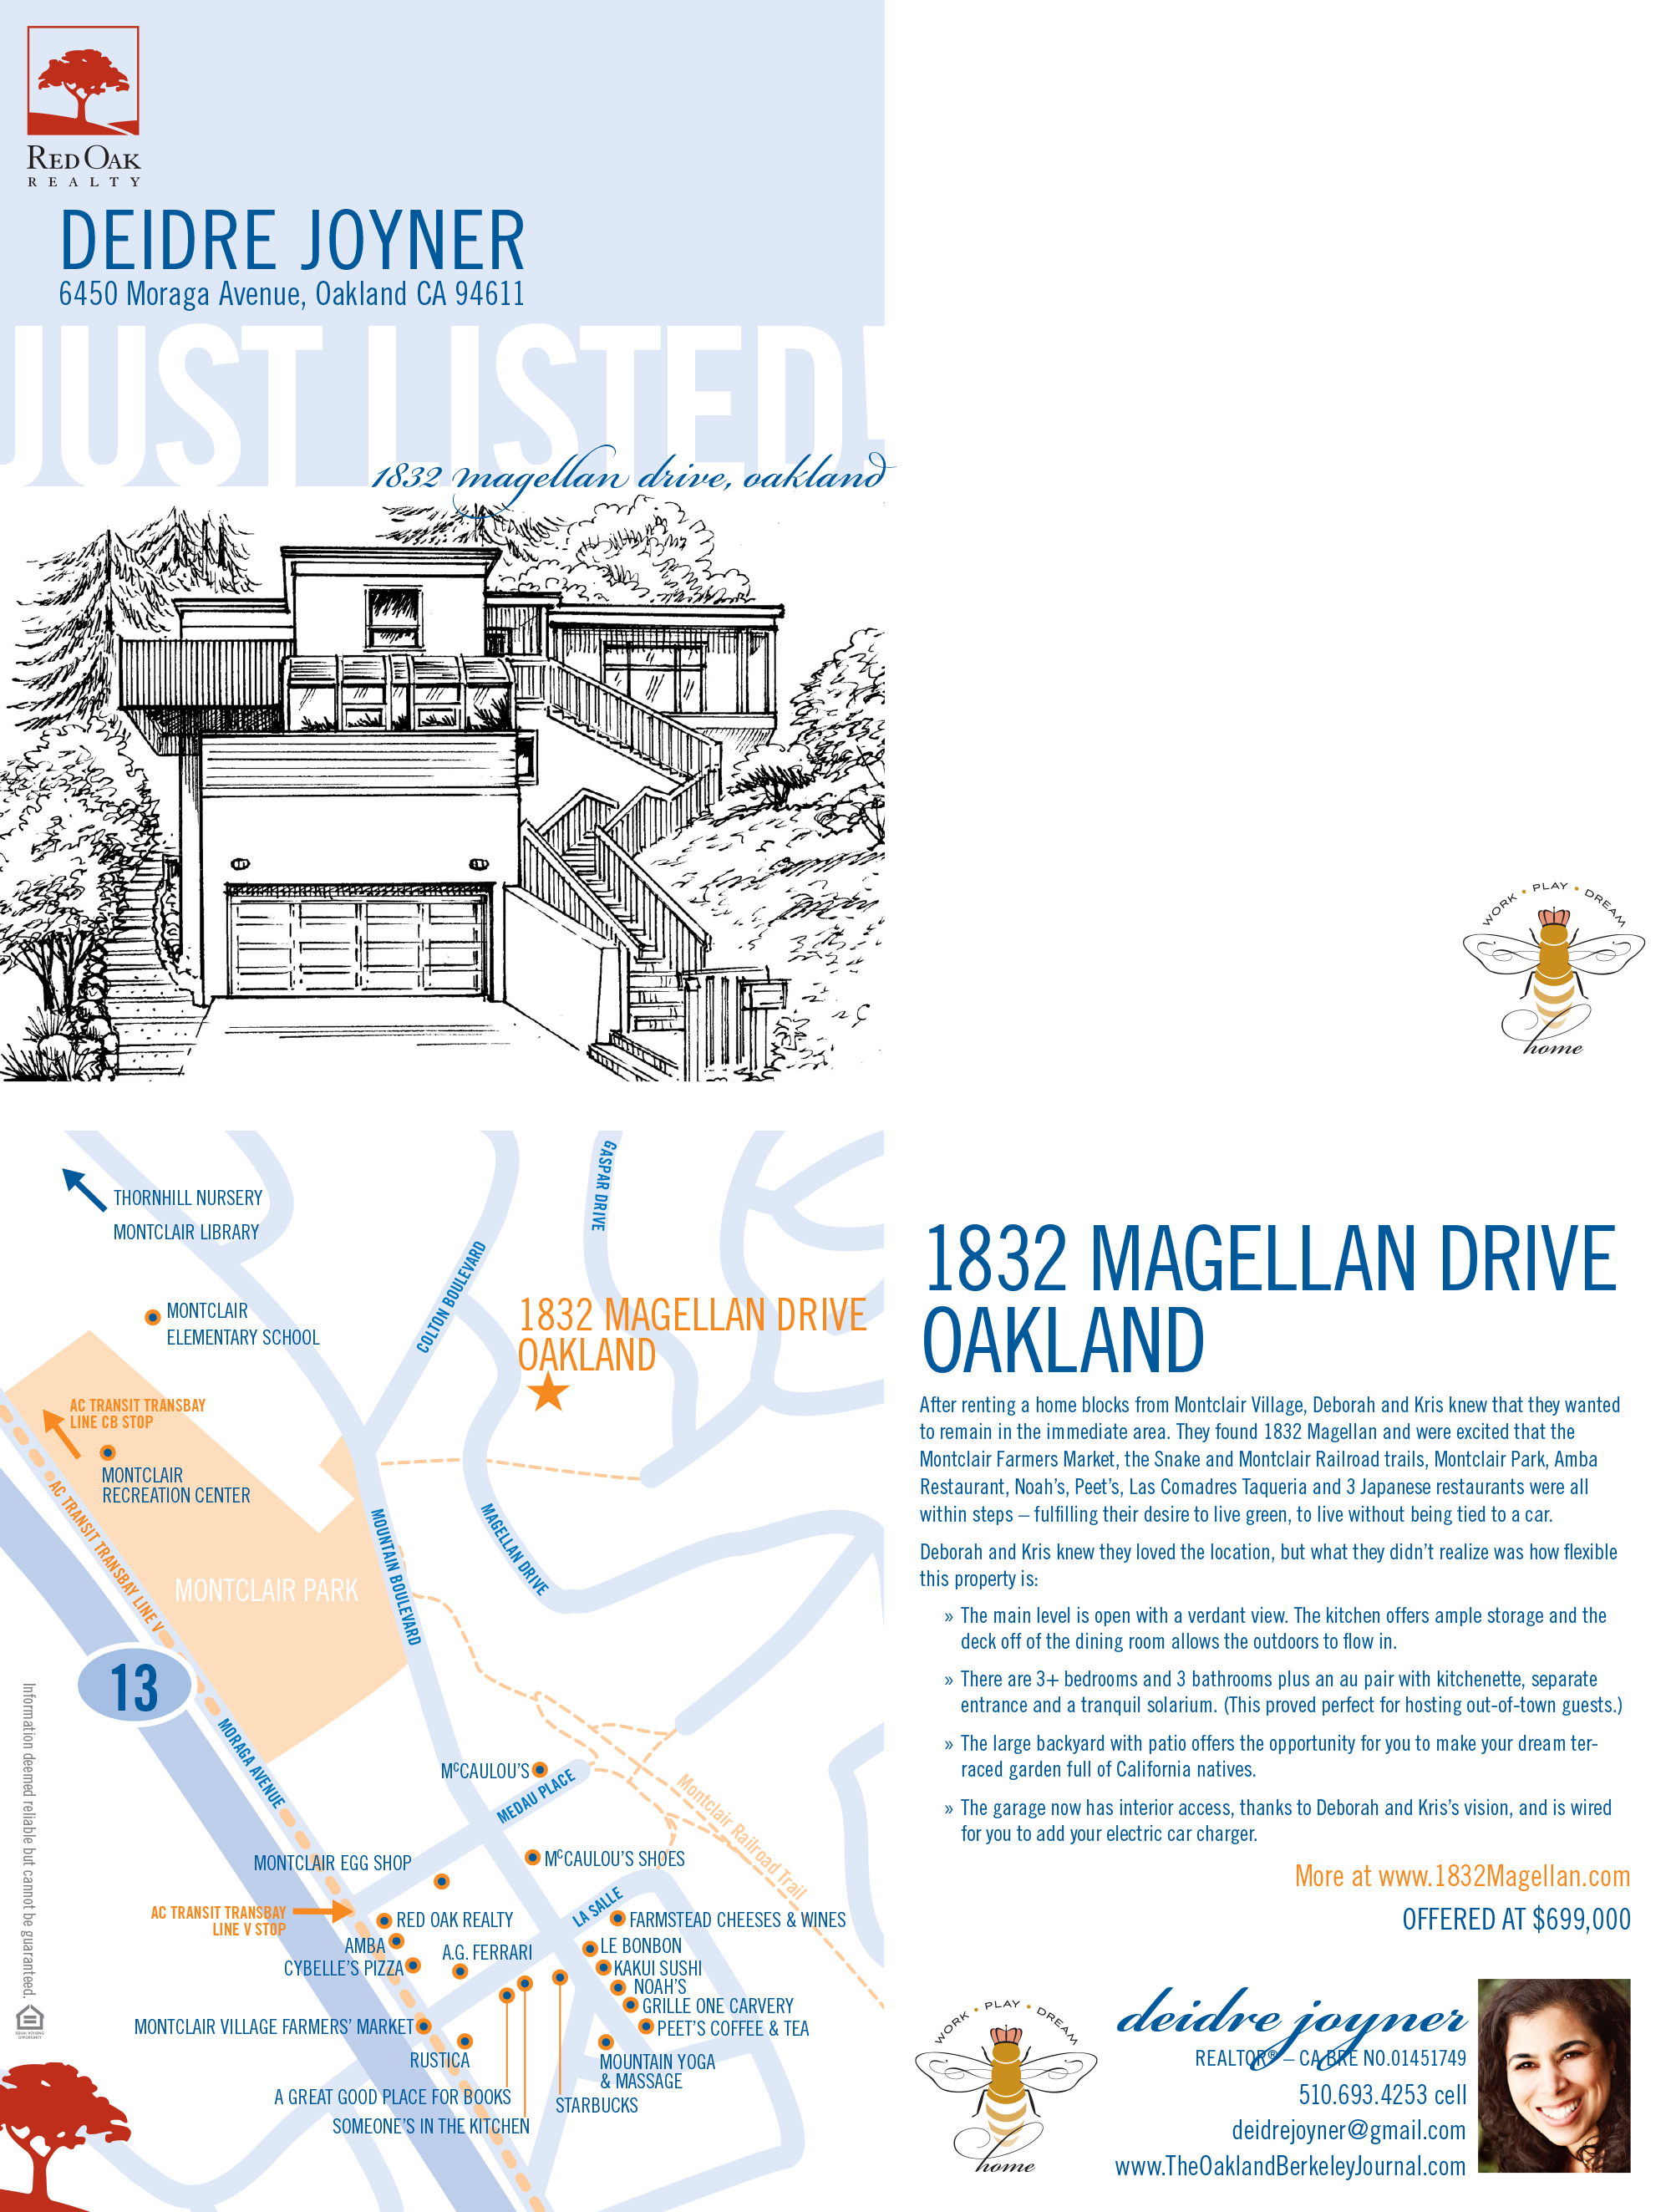 1832 Magellan Drive, Oakland